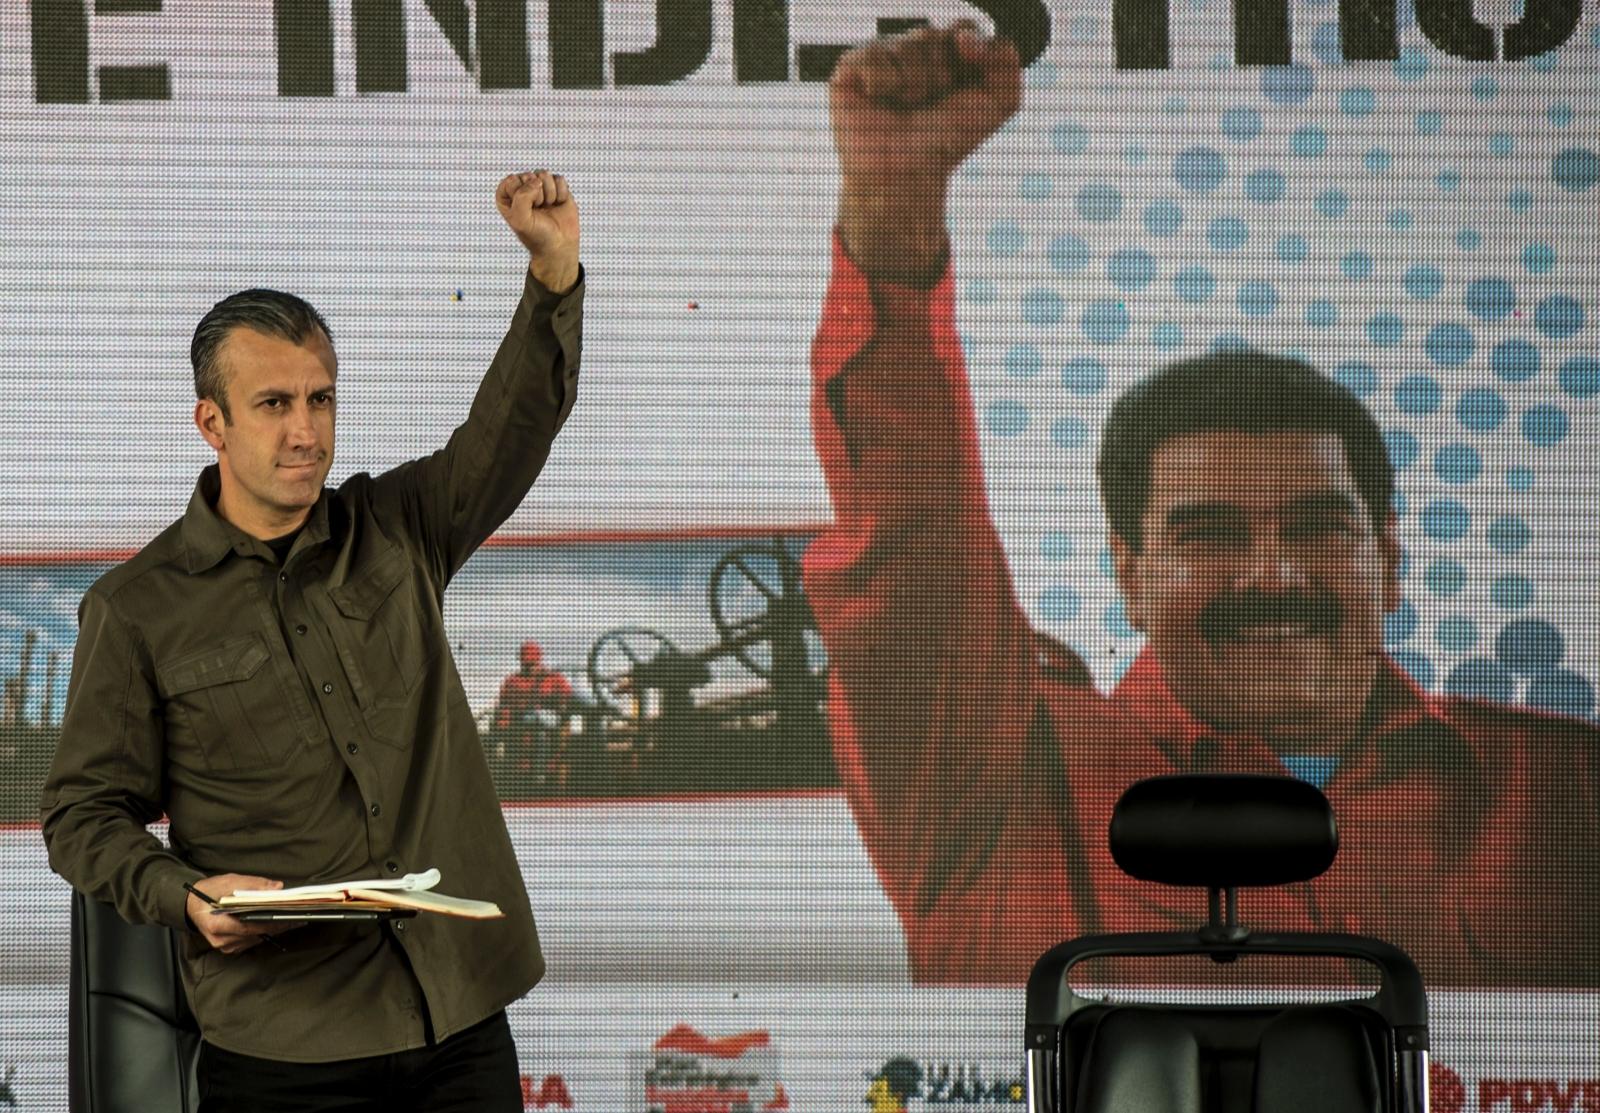 Tarej El Aissami at Caracas rally